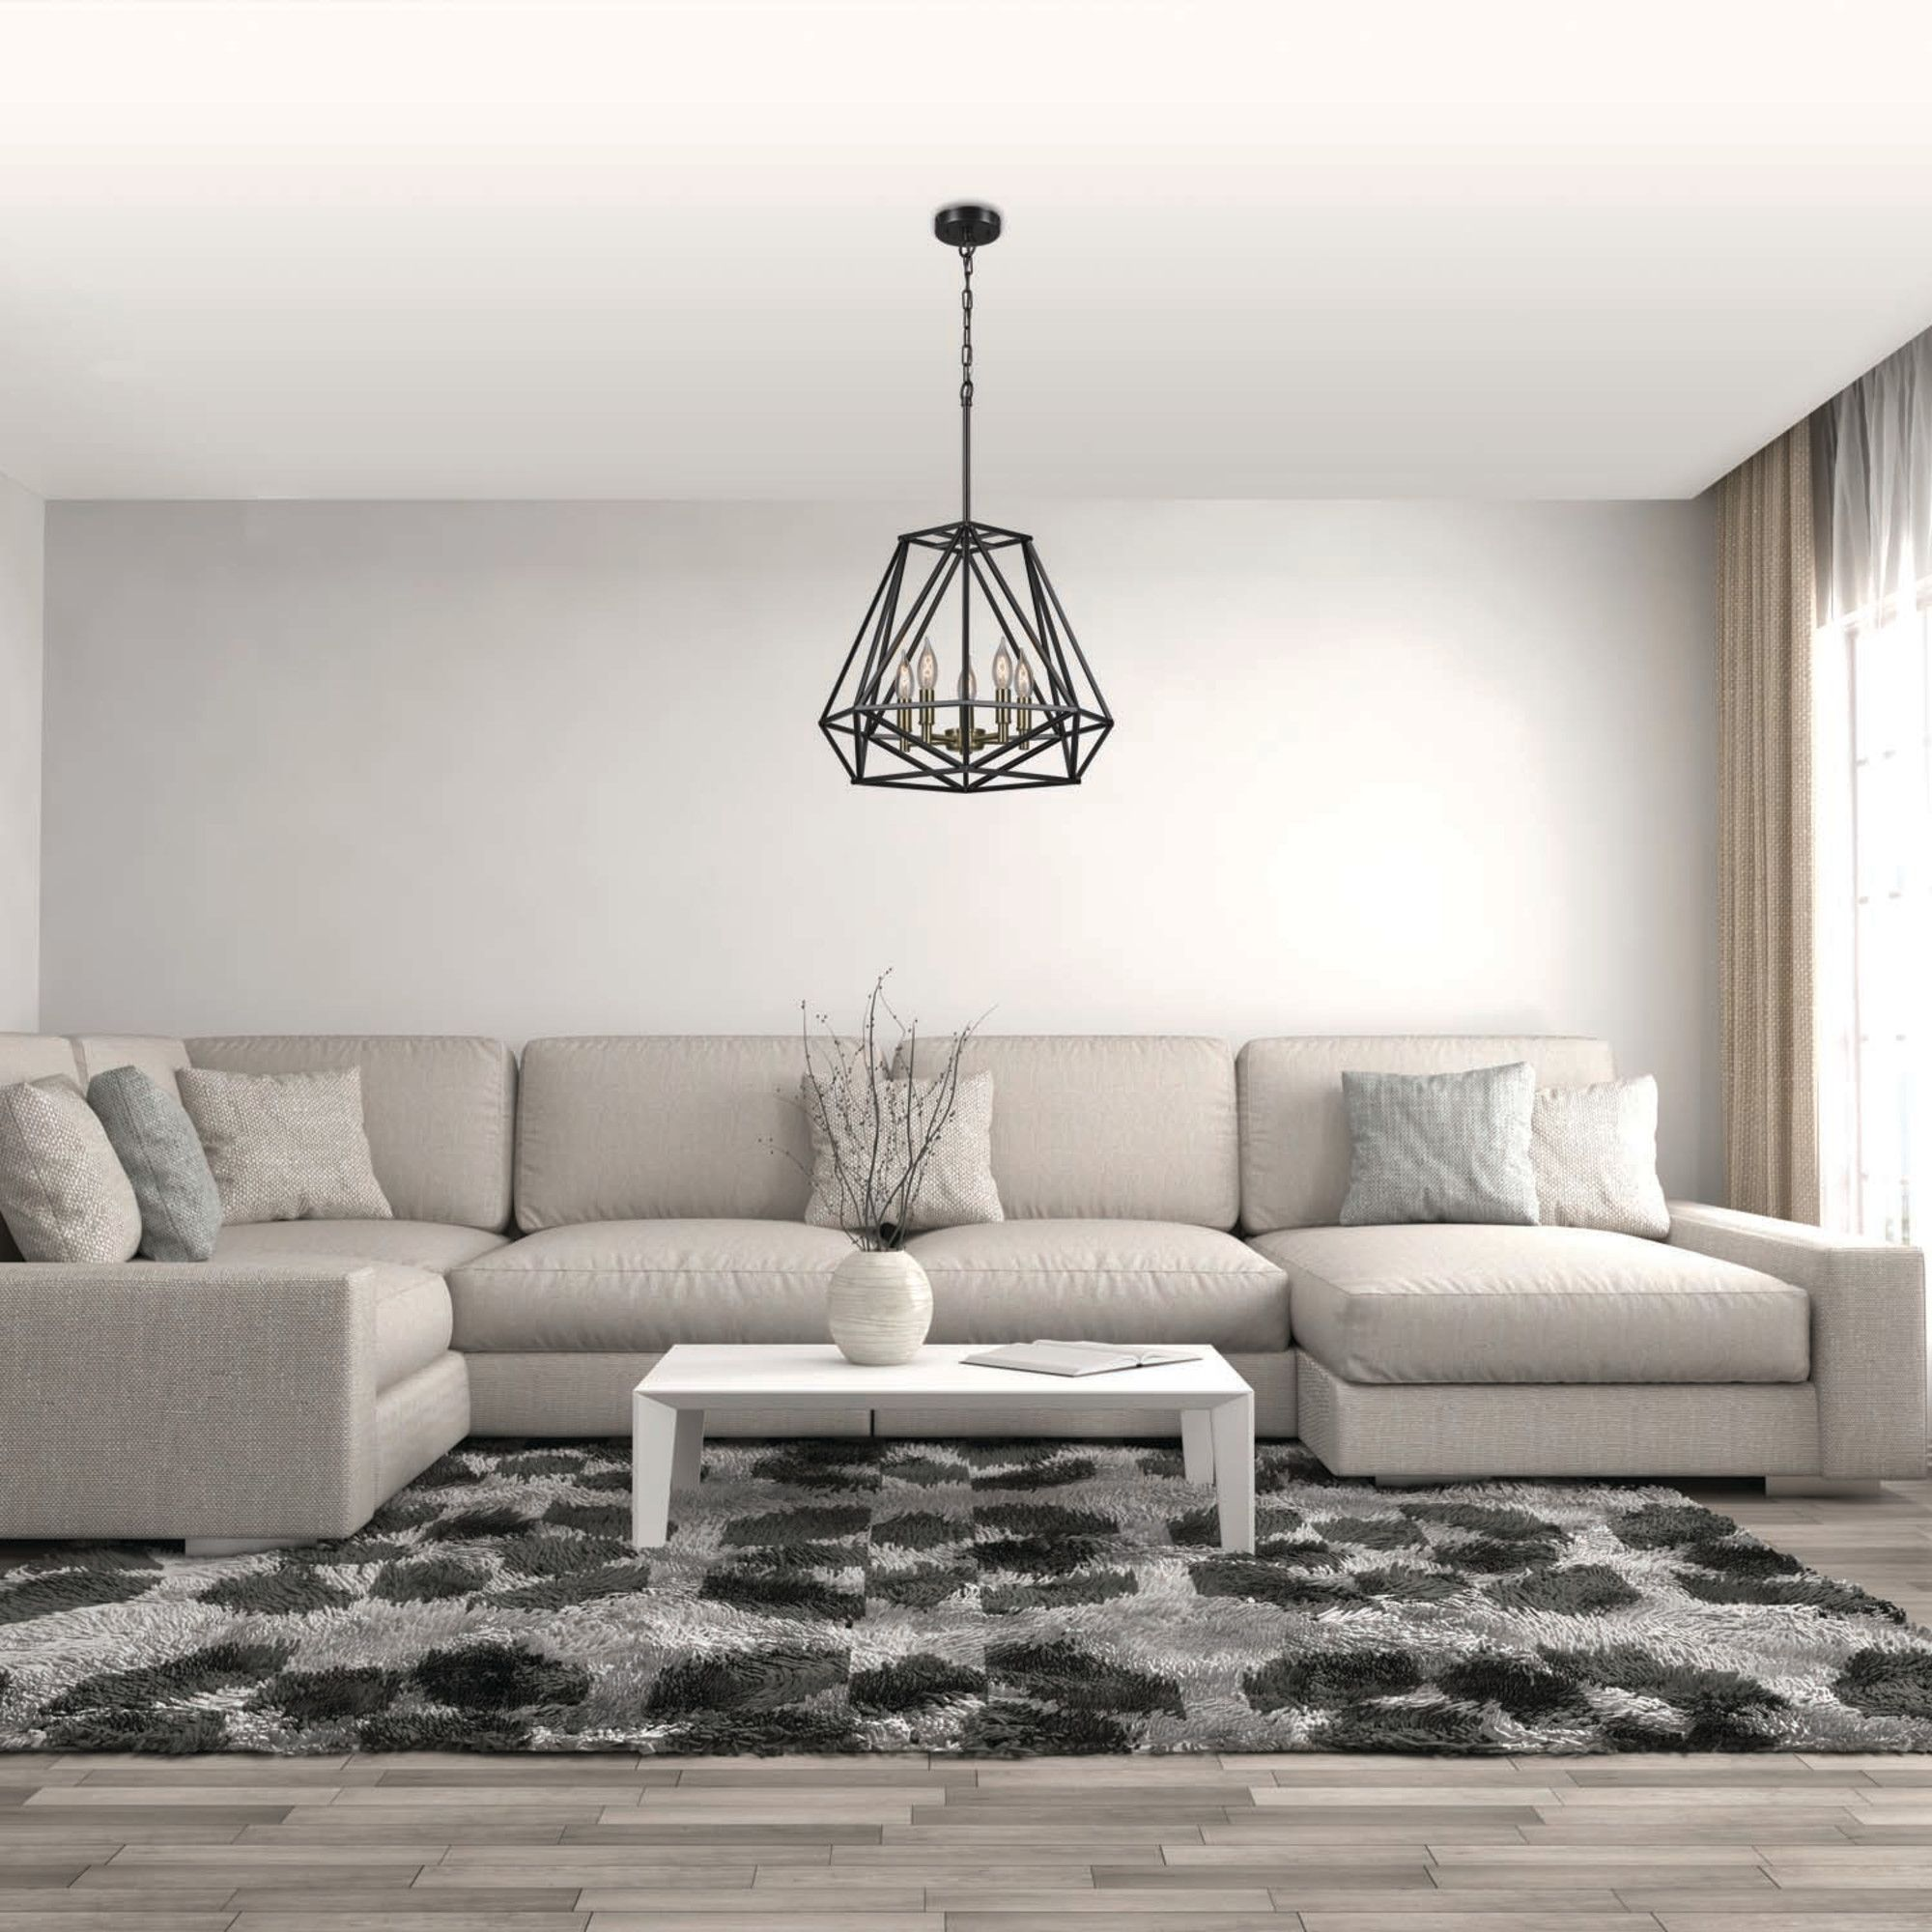 https://www.wayfair.com/Globe-Electric-Company-Sansa-5-Light-Chandelier-65435-GLEC1454.html